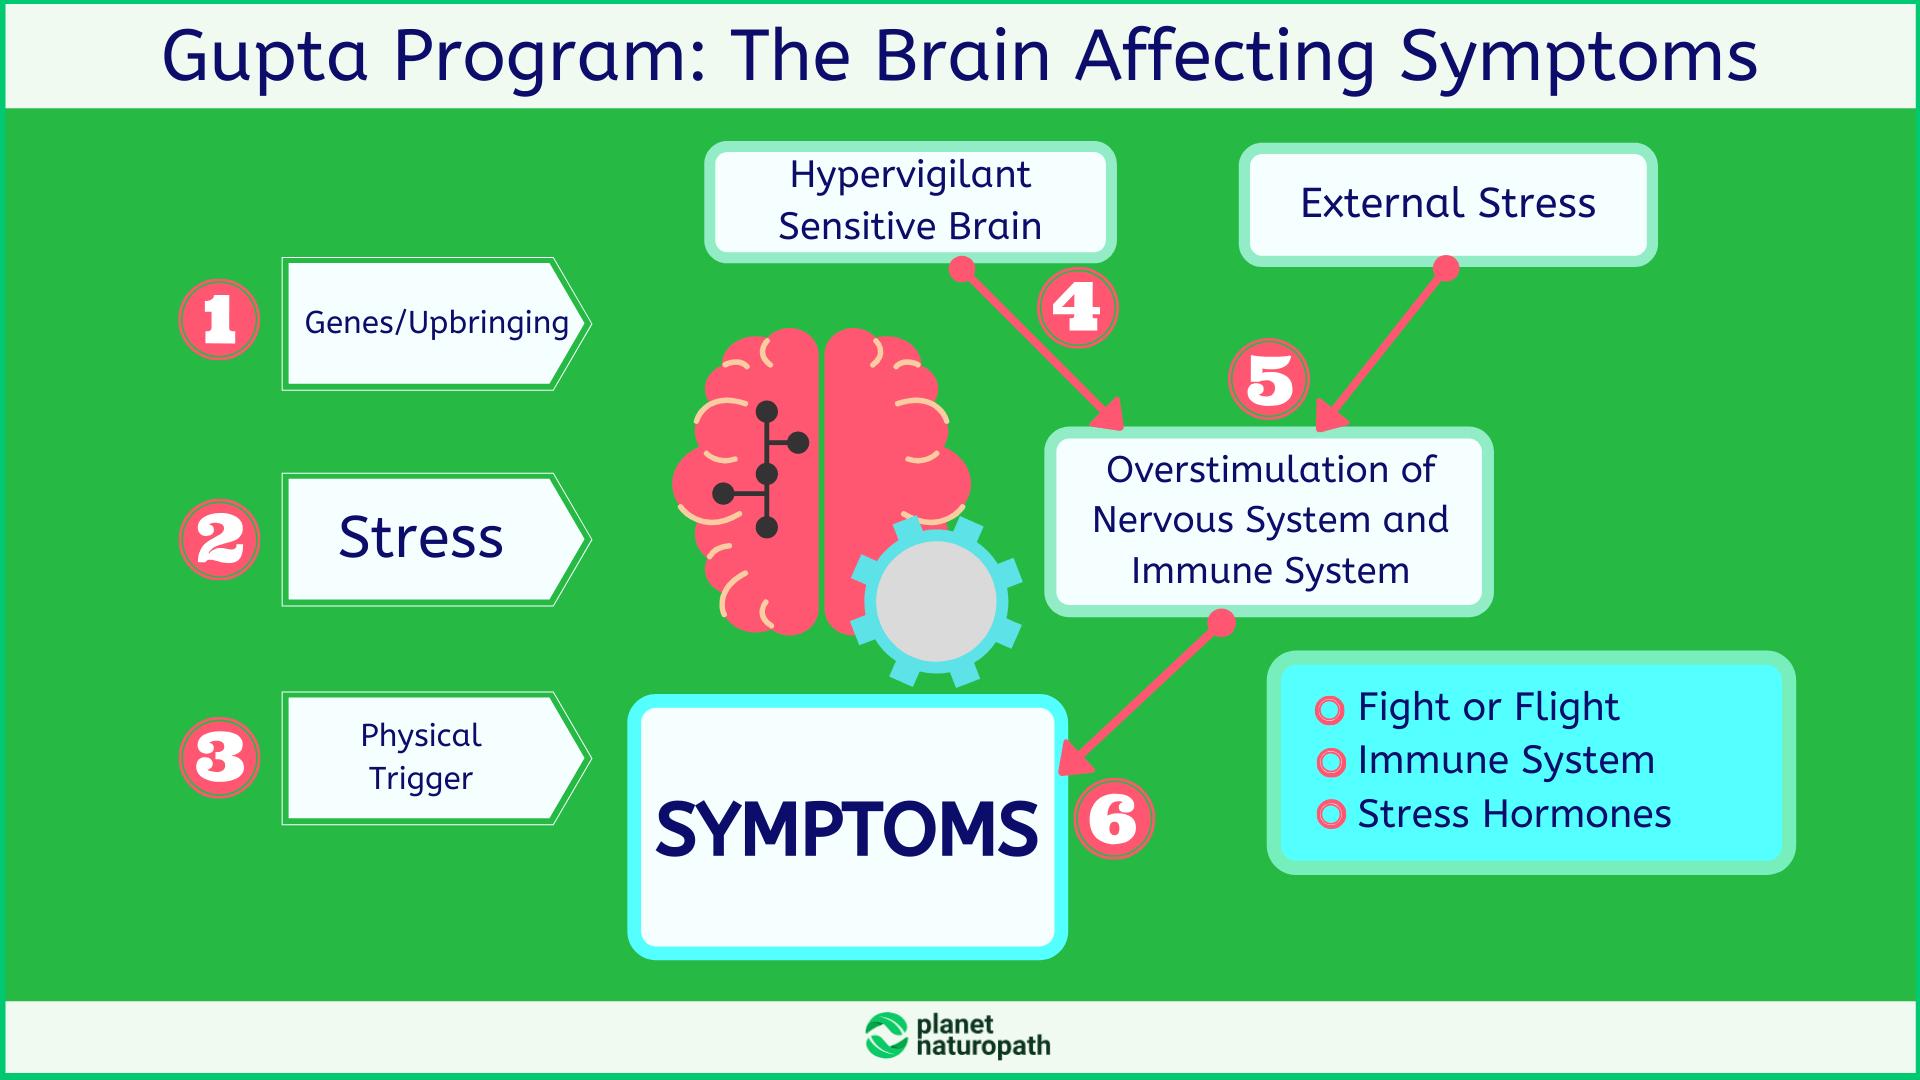 Gupta-Program_-The-Brain-Affecting-Symptoms